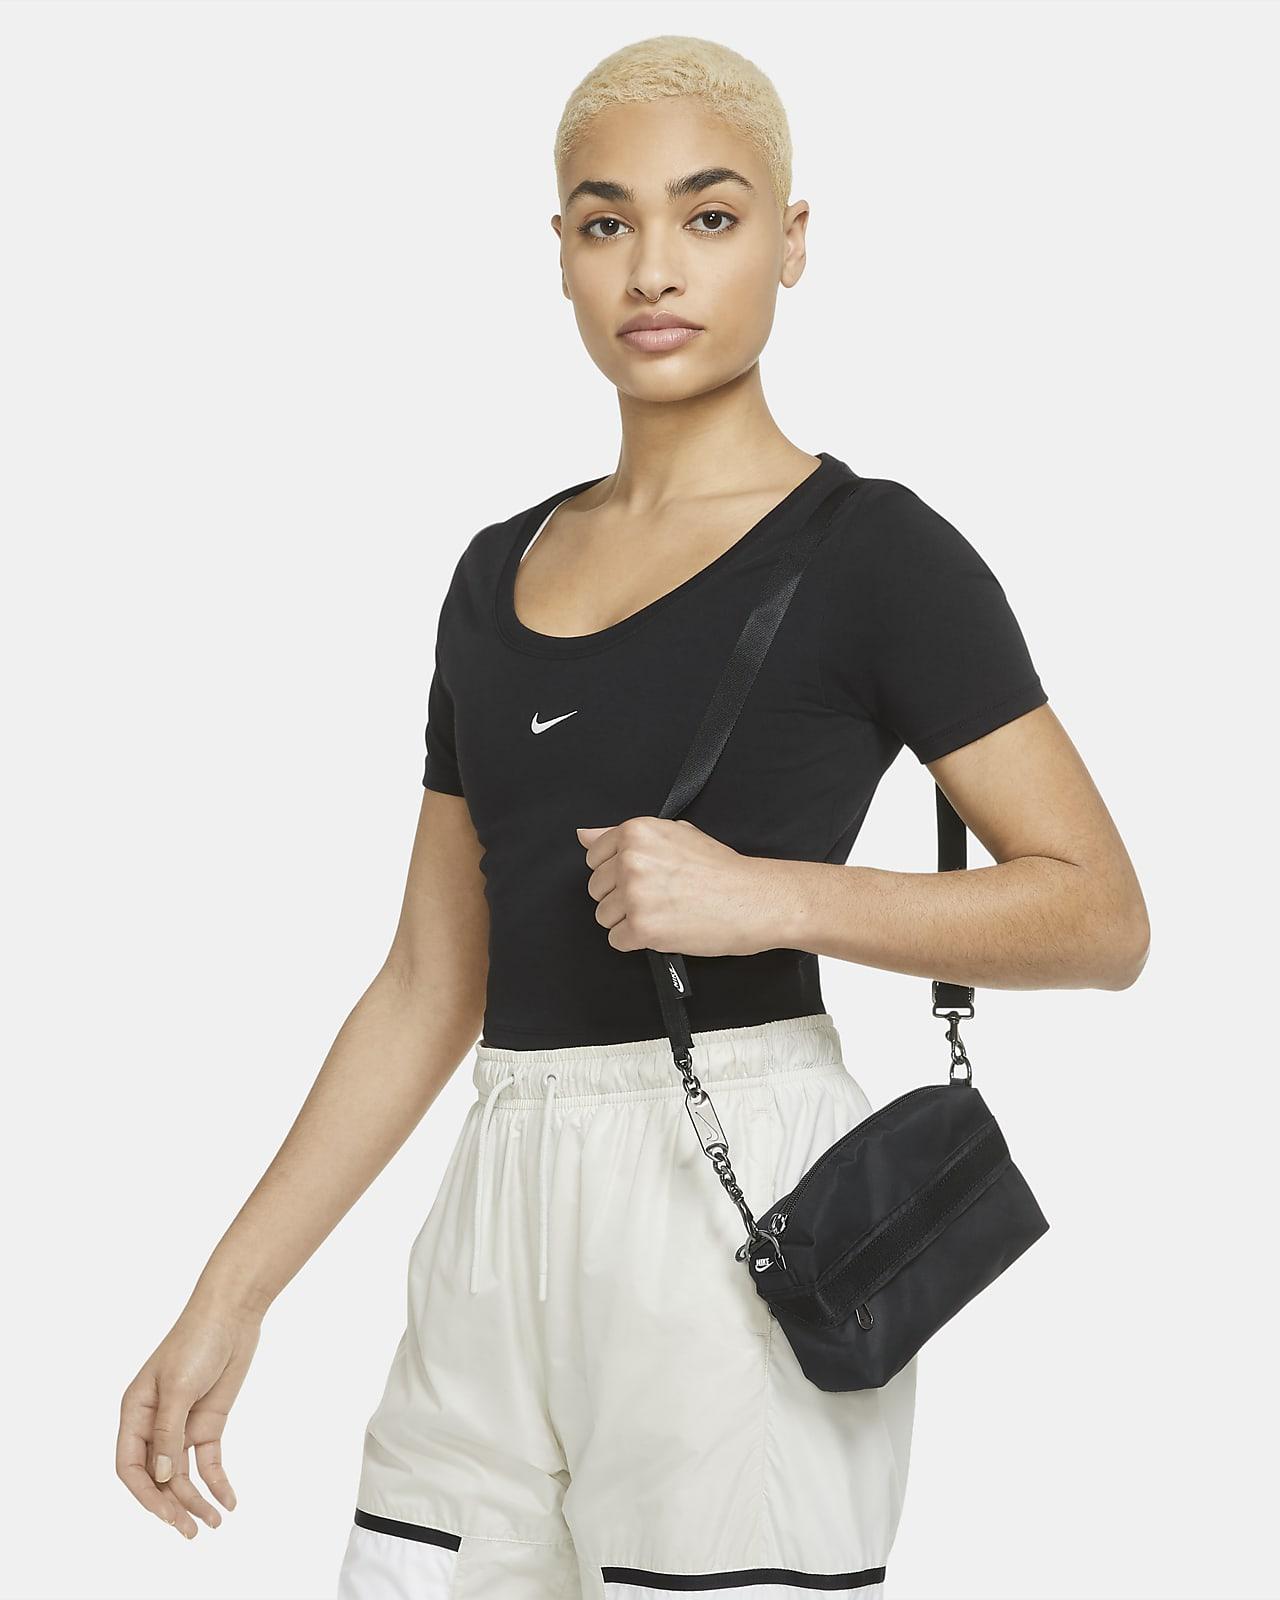 Женская сумка через плечо Nike Sportswear Futura Luxe